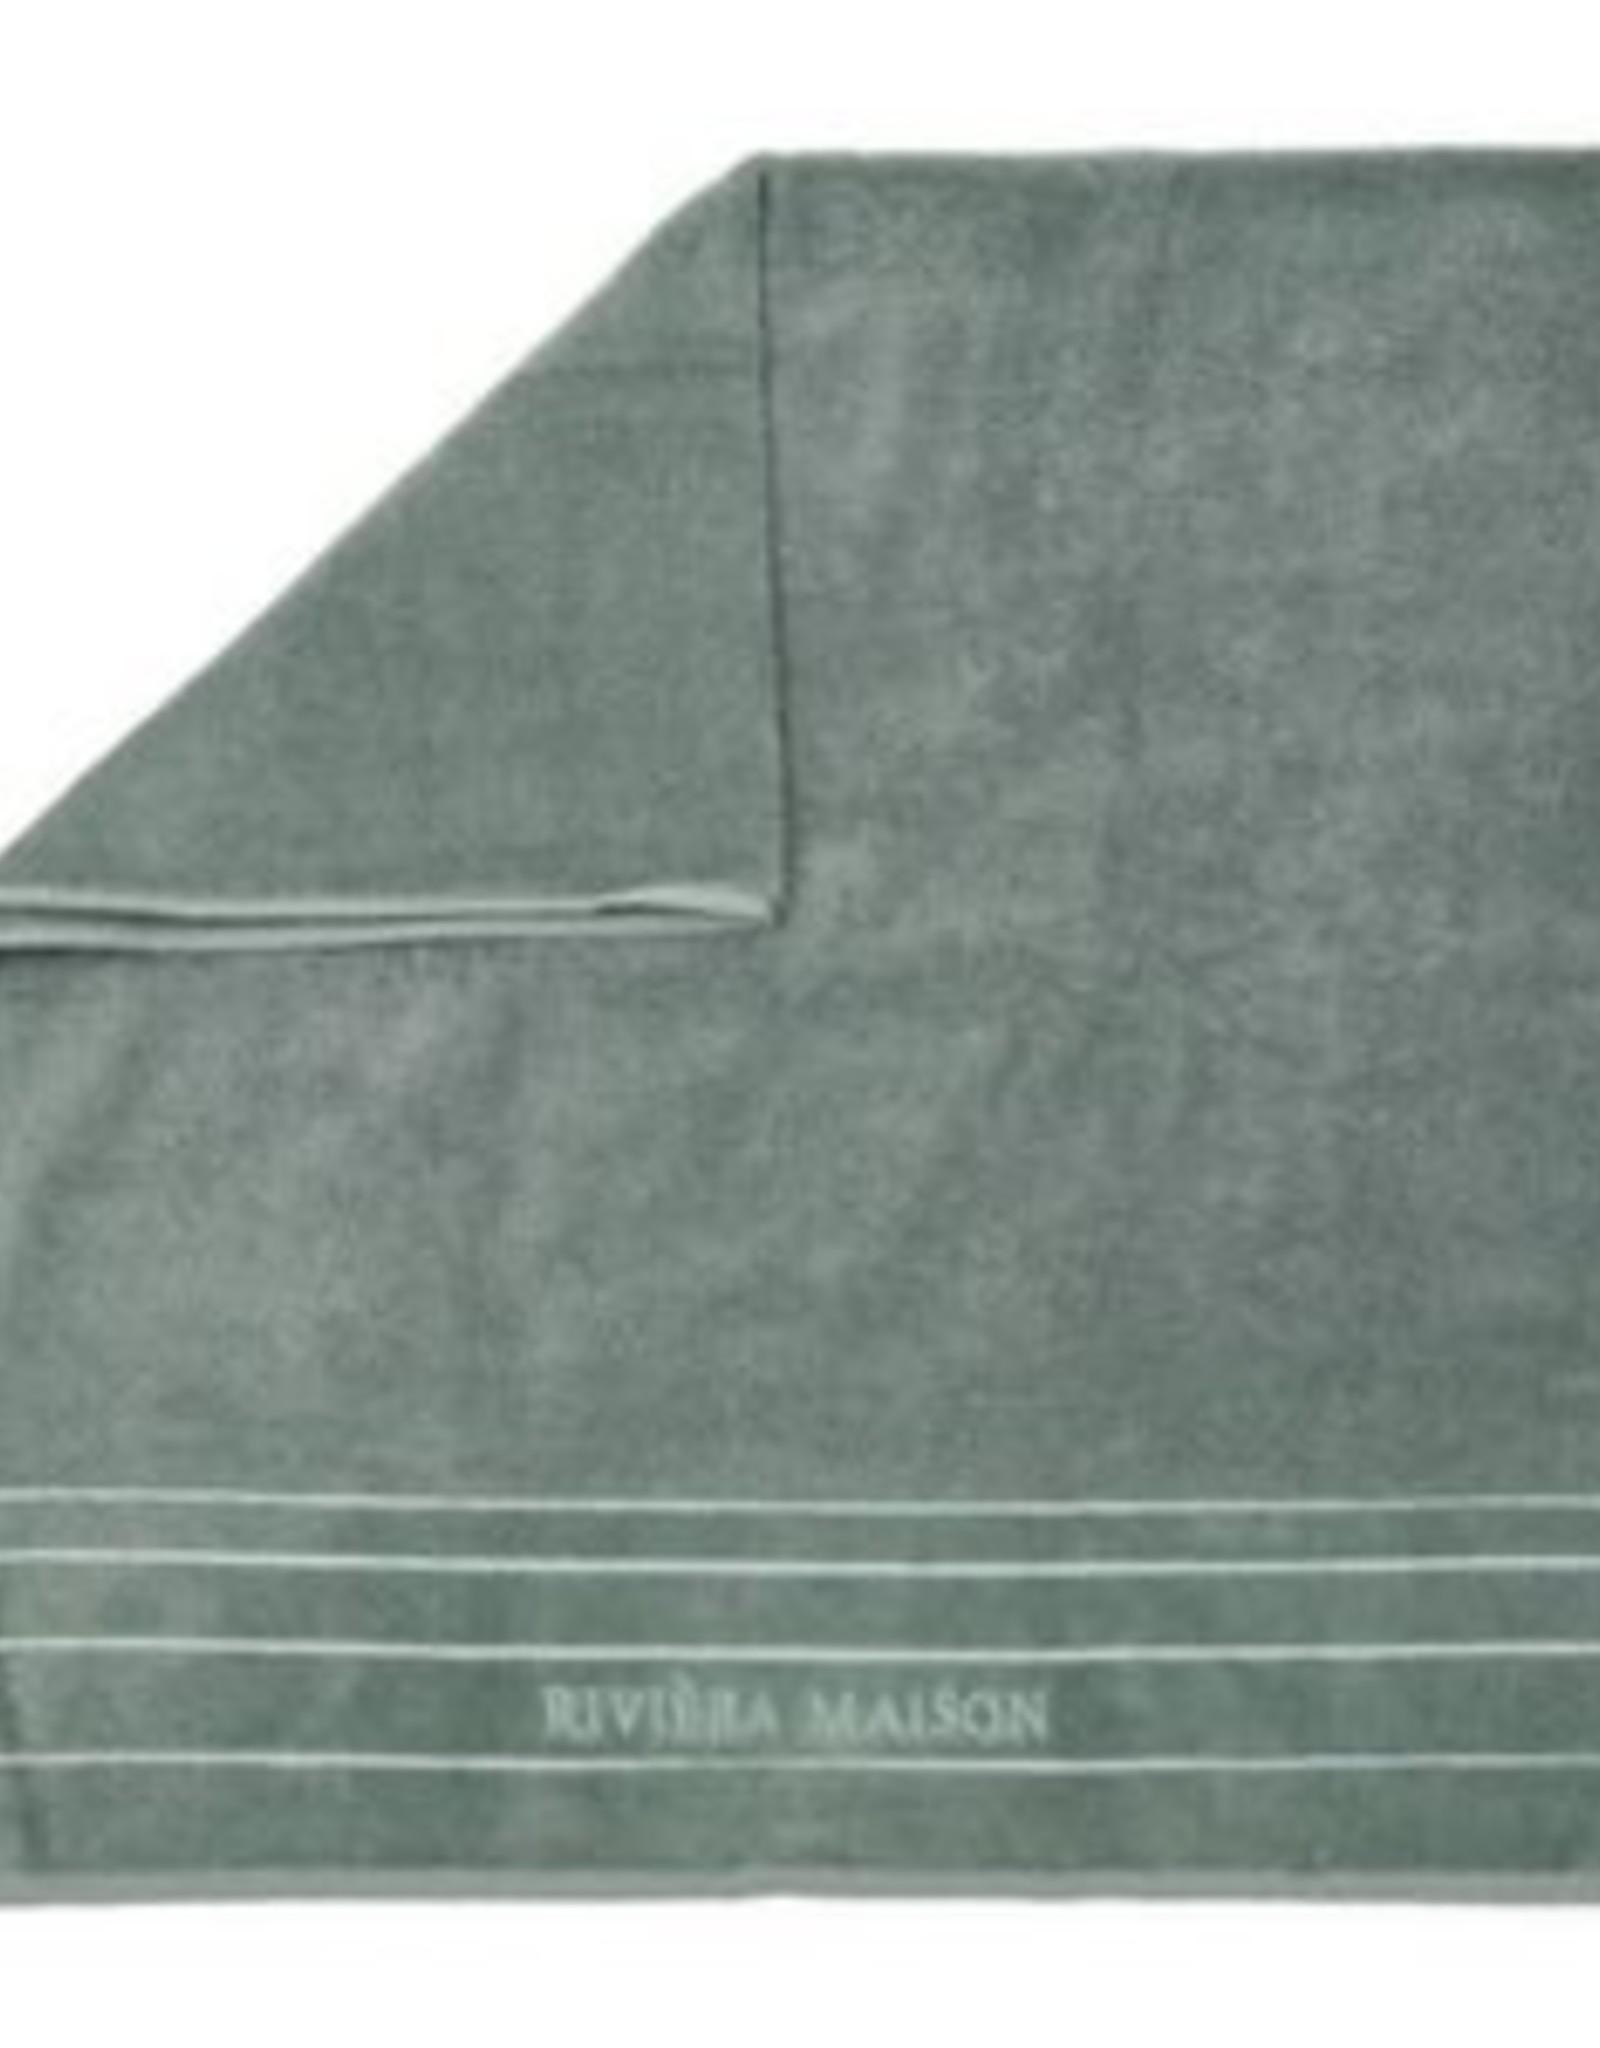 Riviera Maison RM Elegant Towel moss 100x50